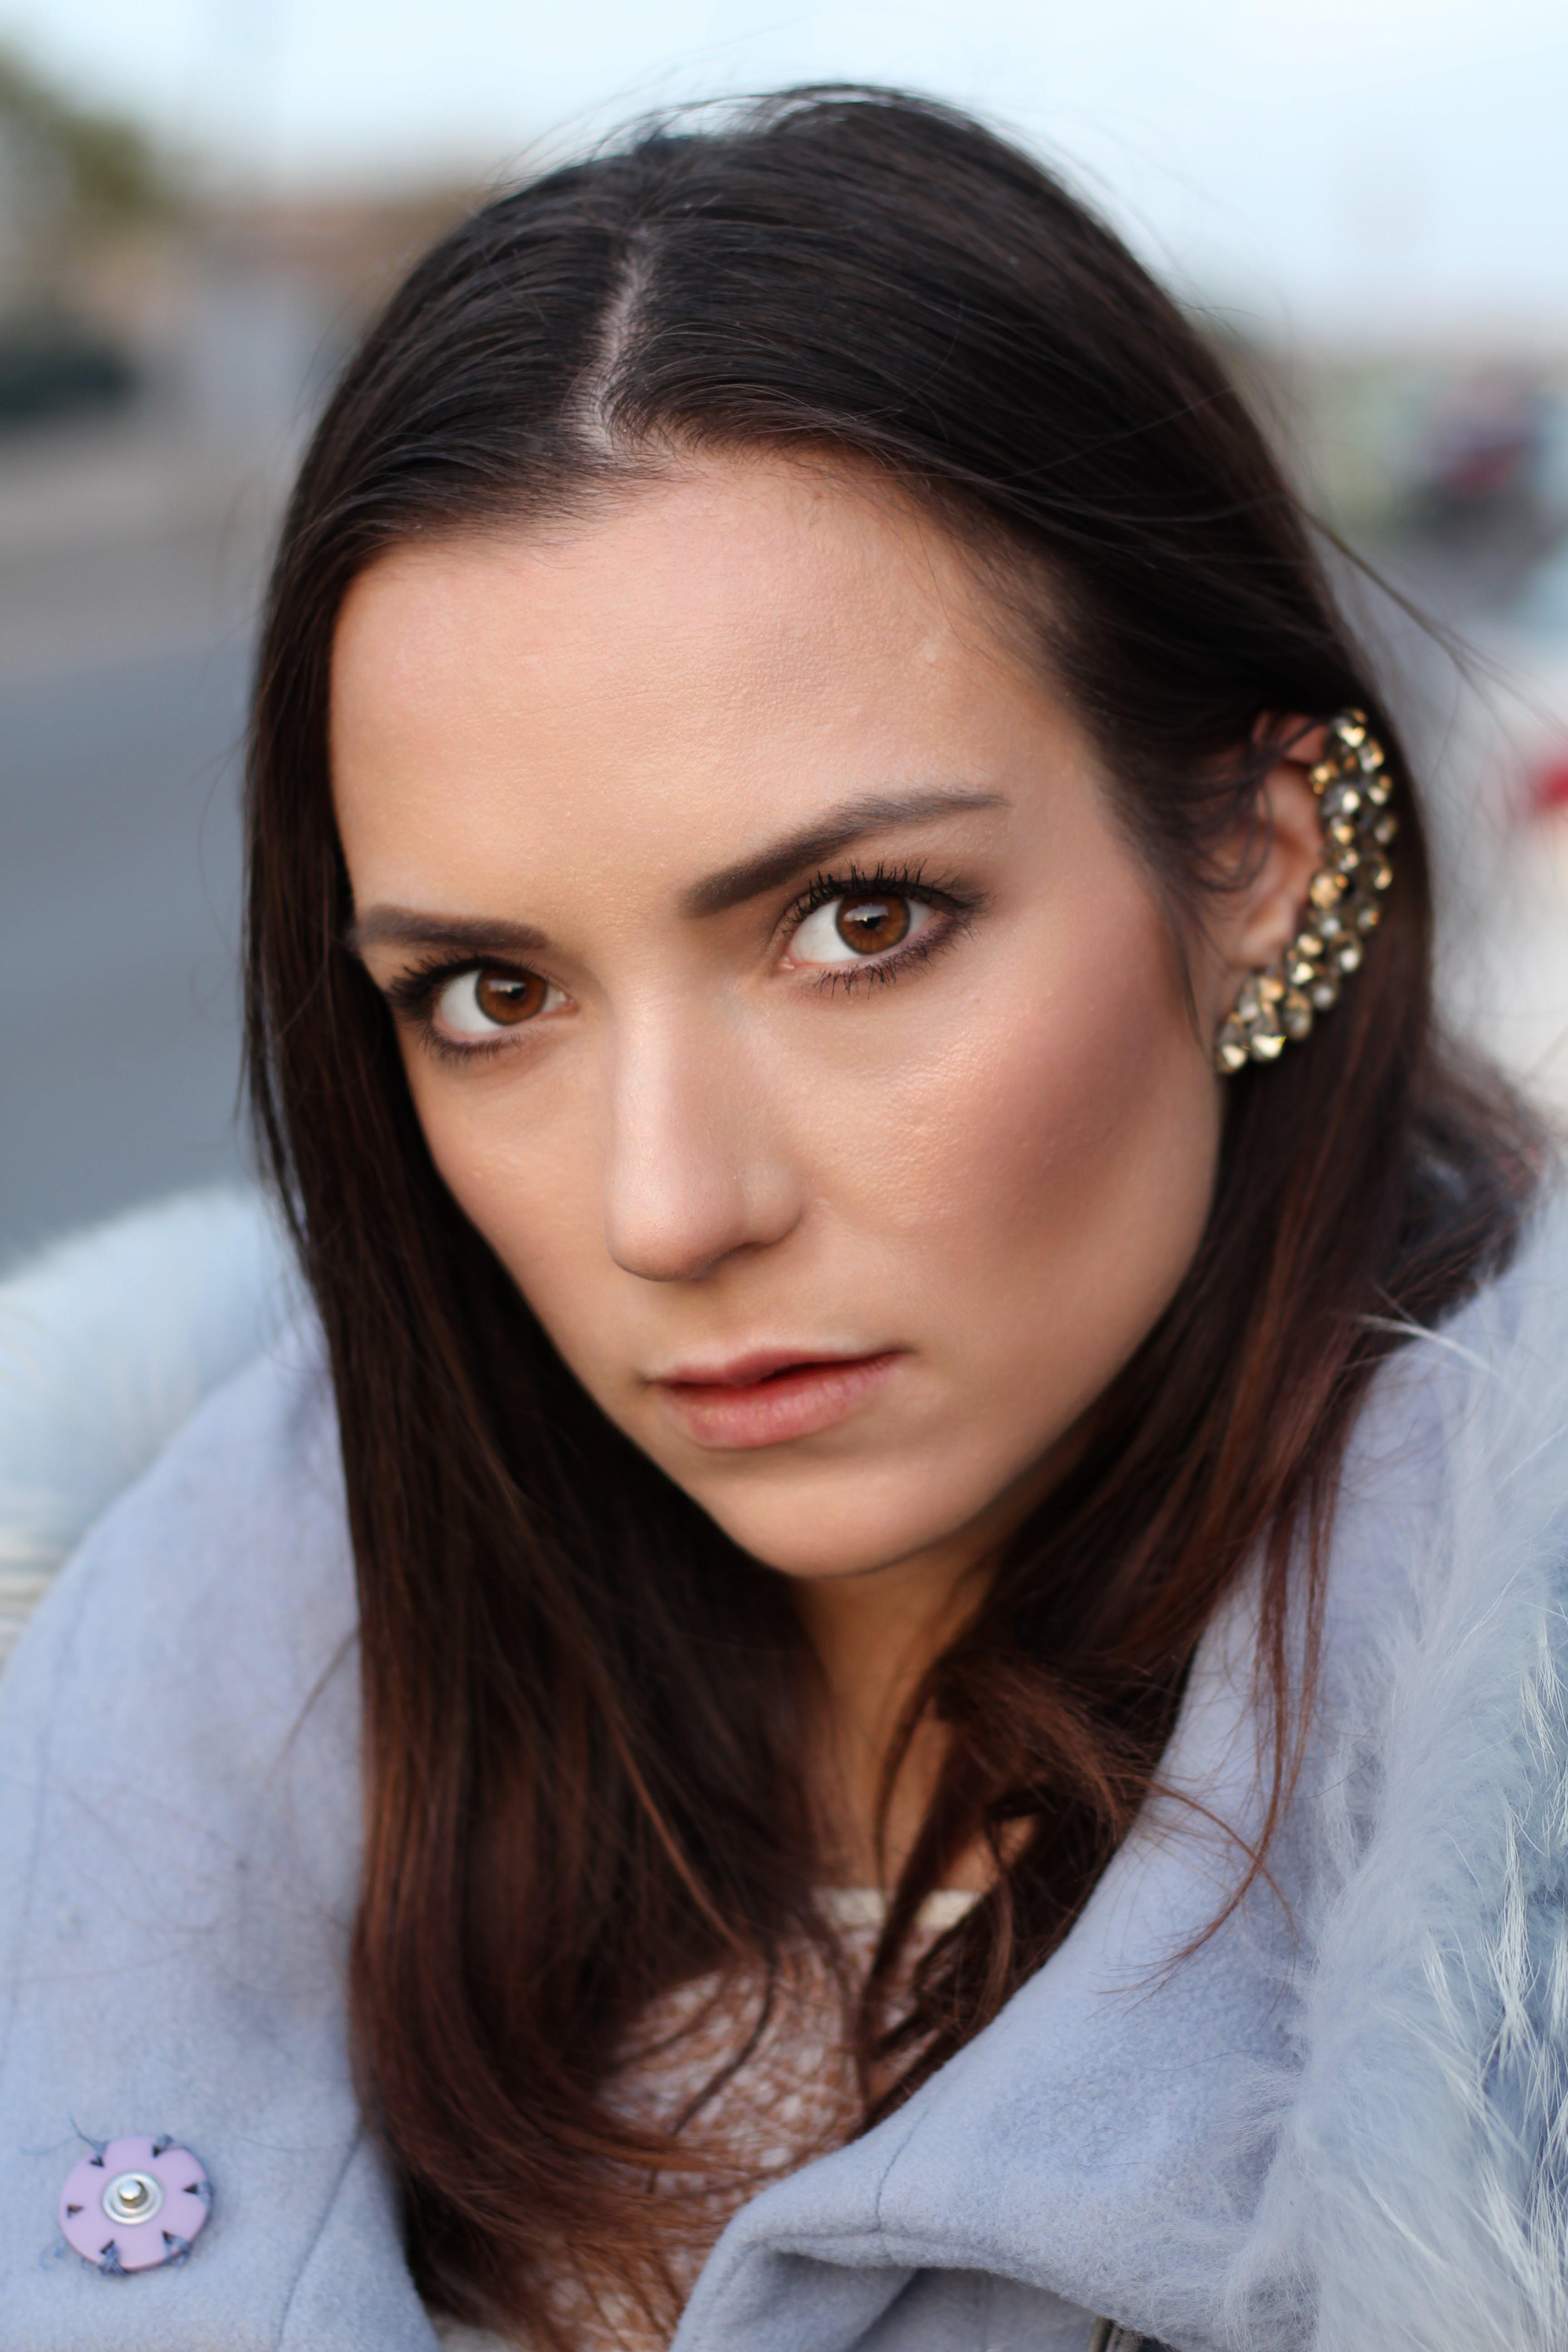 Free stock photo of business woman, earcuff, fashion, fashion blogger